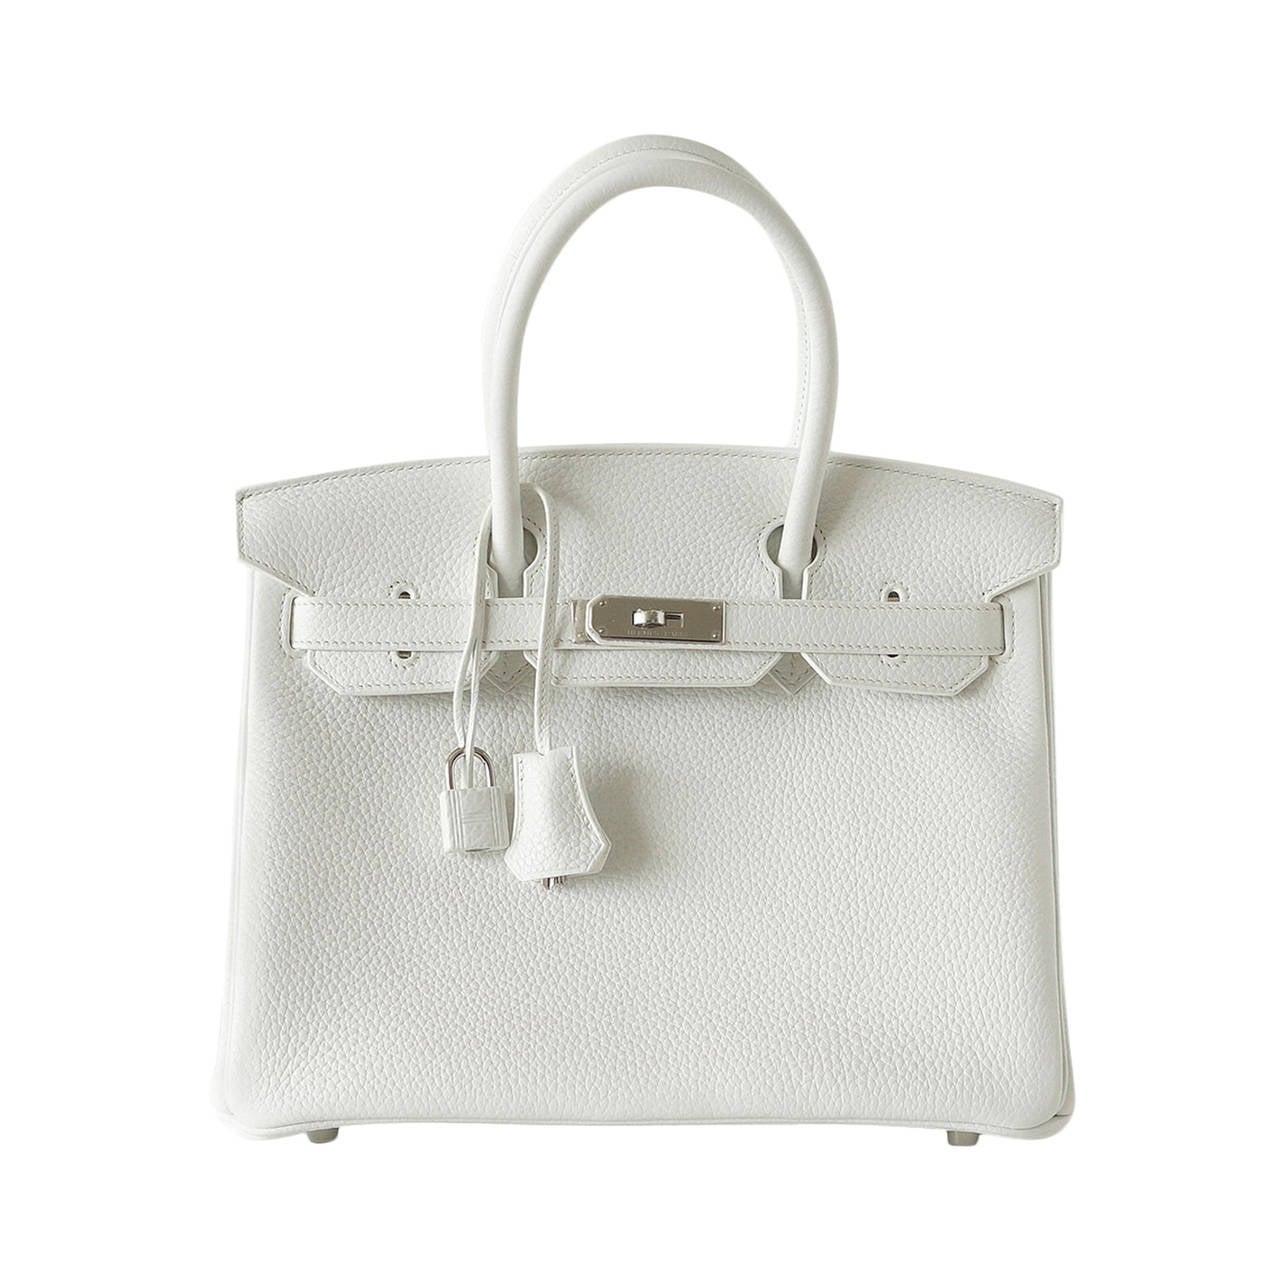 where to buy hermes birkin bag - mightychic Top Handle Bags - Miami, FL 33138 - 1stdibs - Page 5